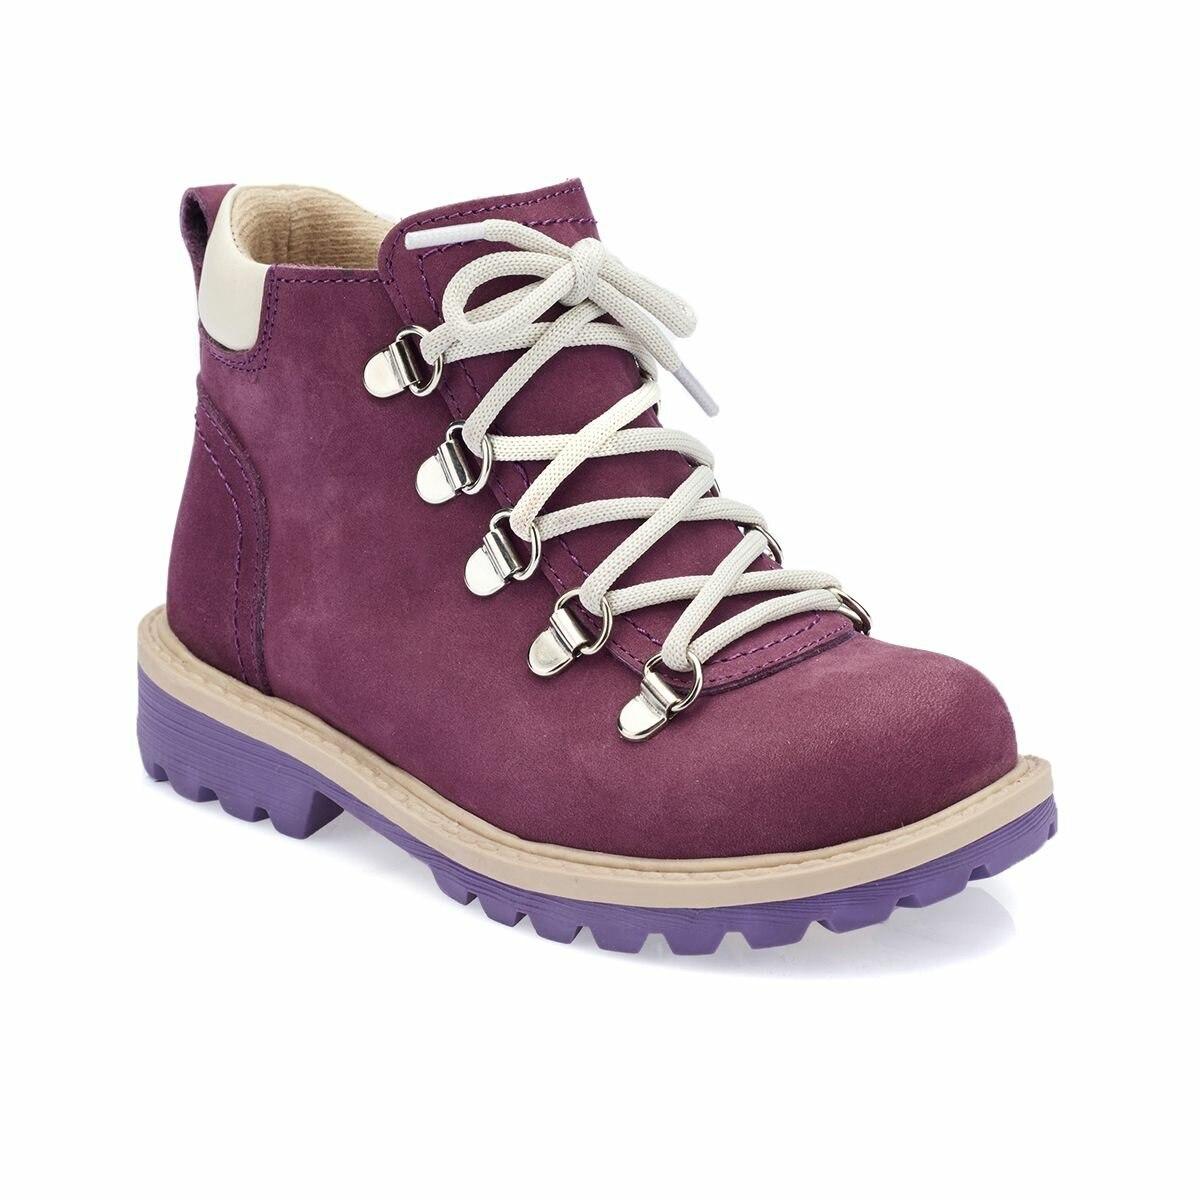 FLO 82. 509544.P Purple Female Child Sneaker Shoes Polaris